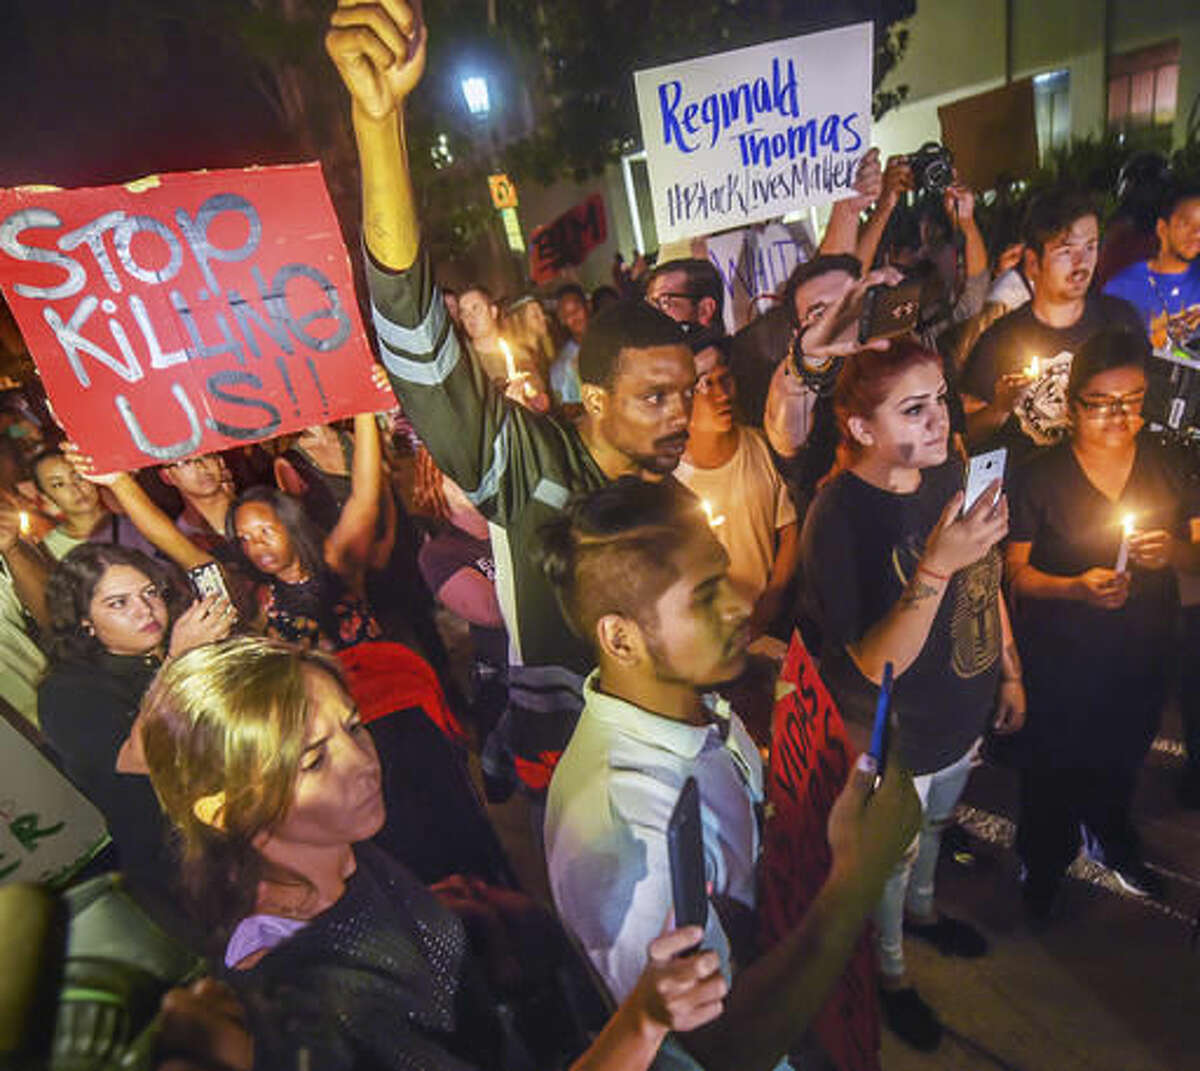 Protesters walk on Garfield Avenue adjacent to the Pasadena City Hall in a candlelight vigil for Reginald Thomas who died earlier in Pasadena Police custody in Pasadena, Calif., on Friday, Sept. 30, 2016. (Walt Mancini/The Pasadena Star-News via AP)